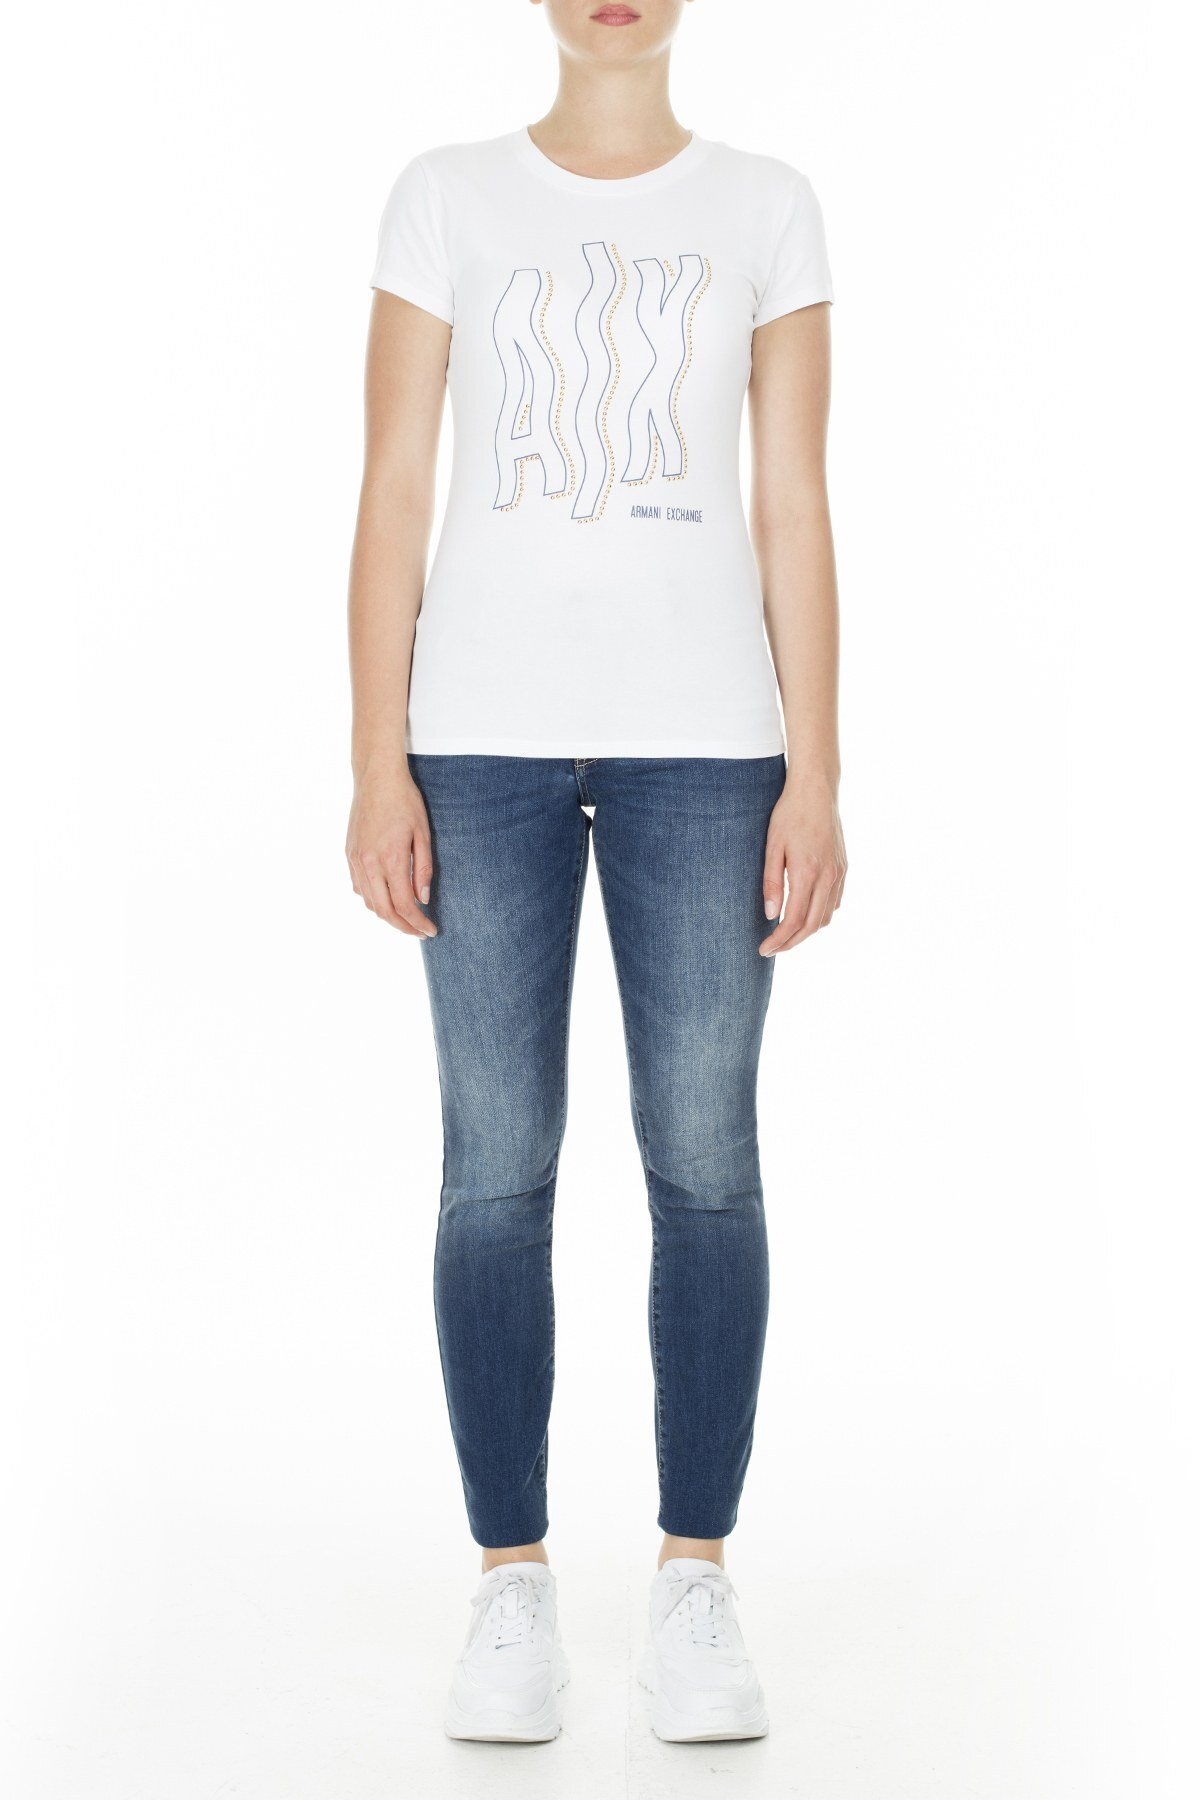 Armani Exchange Kadın T Shirt 3HYTCC YJ19Z 1000 BEYAZ